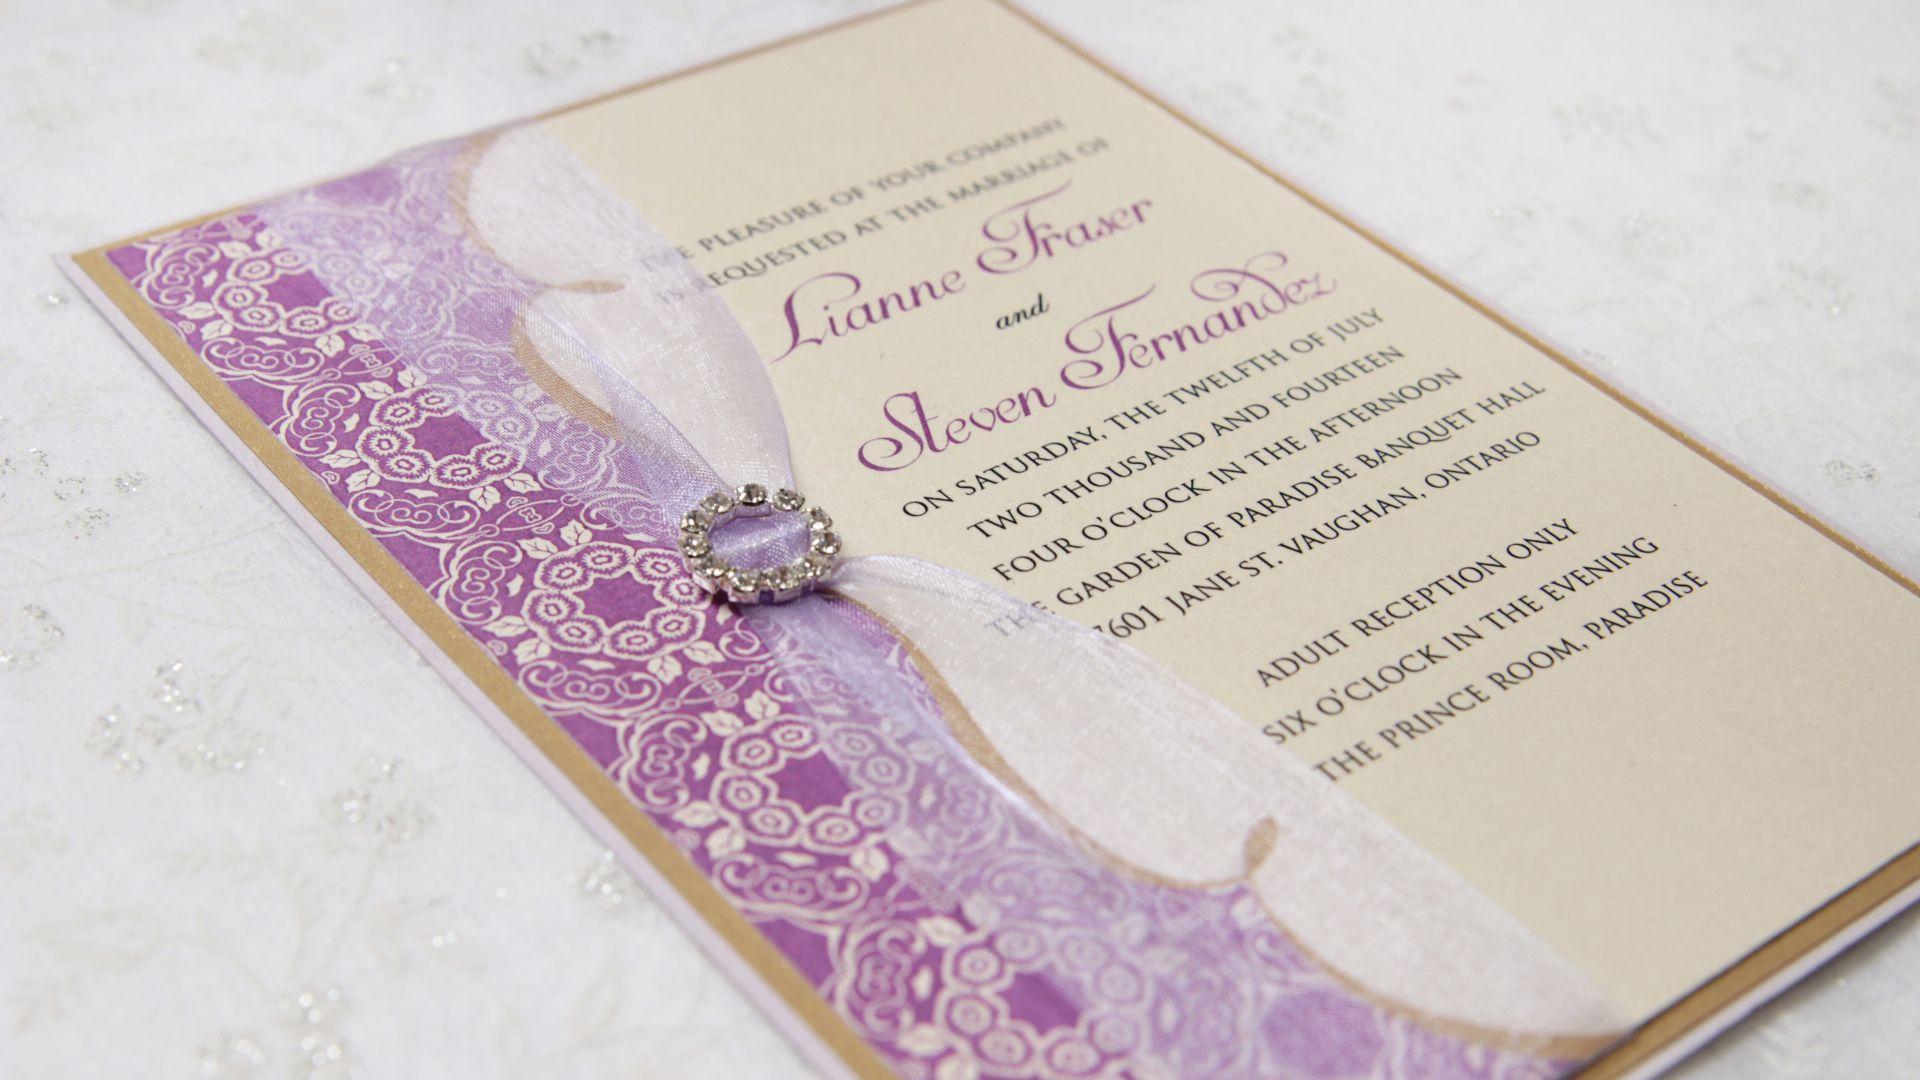 Beautiful purple flower print pattern design with jewel brooch on